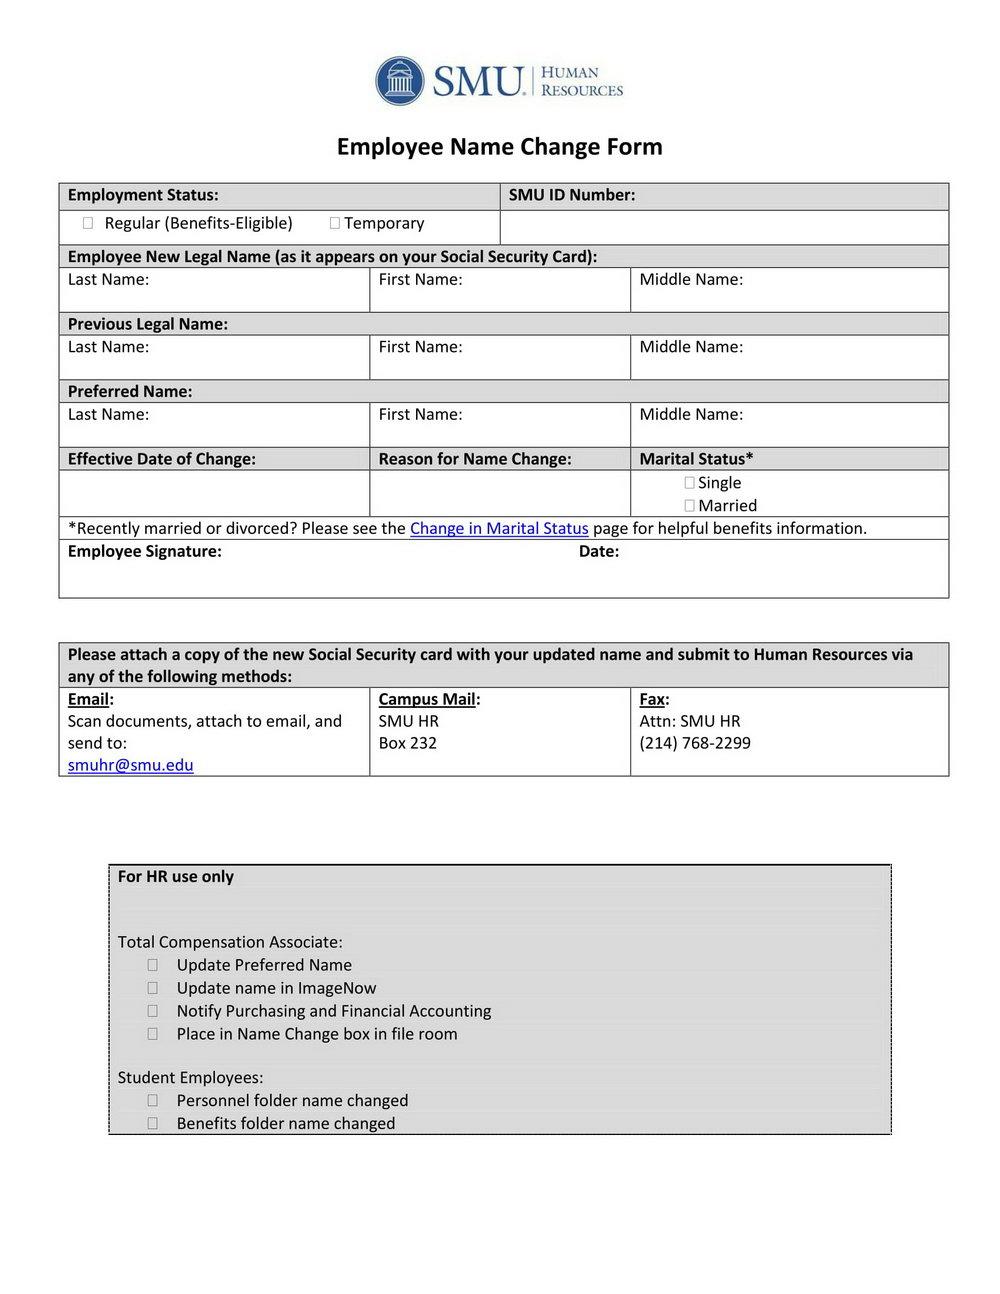 Ssa.gov Forms Name Change